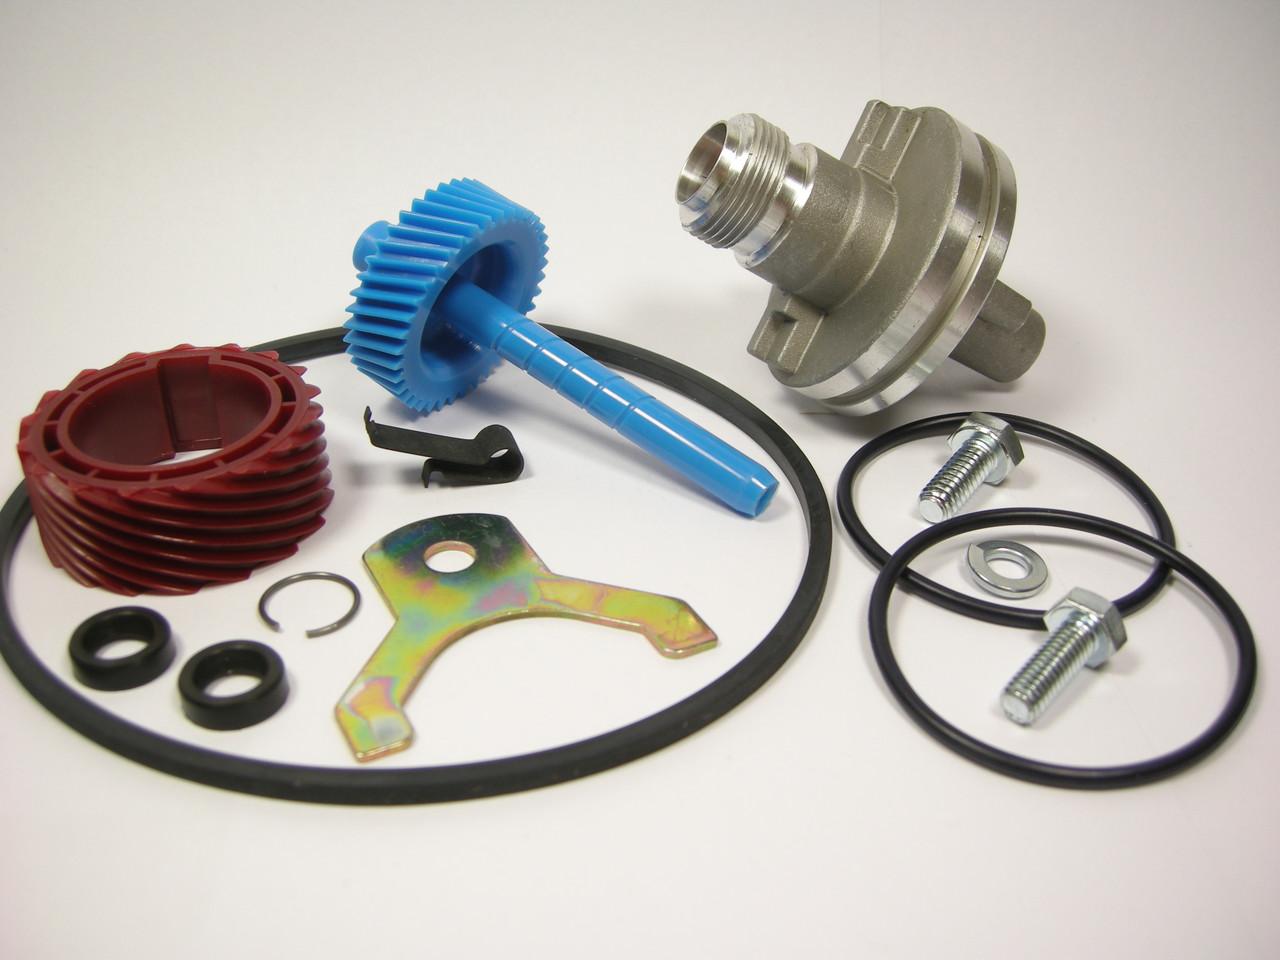 700R4 TH350 17 & 38 Tooth Speedo Kit Gears Housing Speedometer Parts